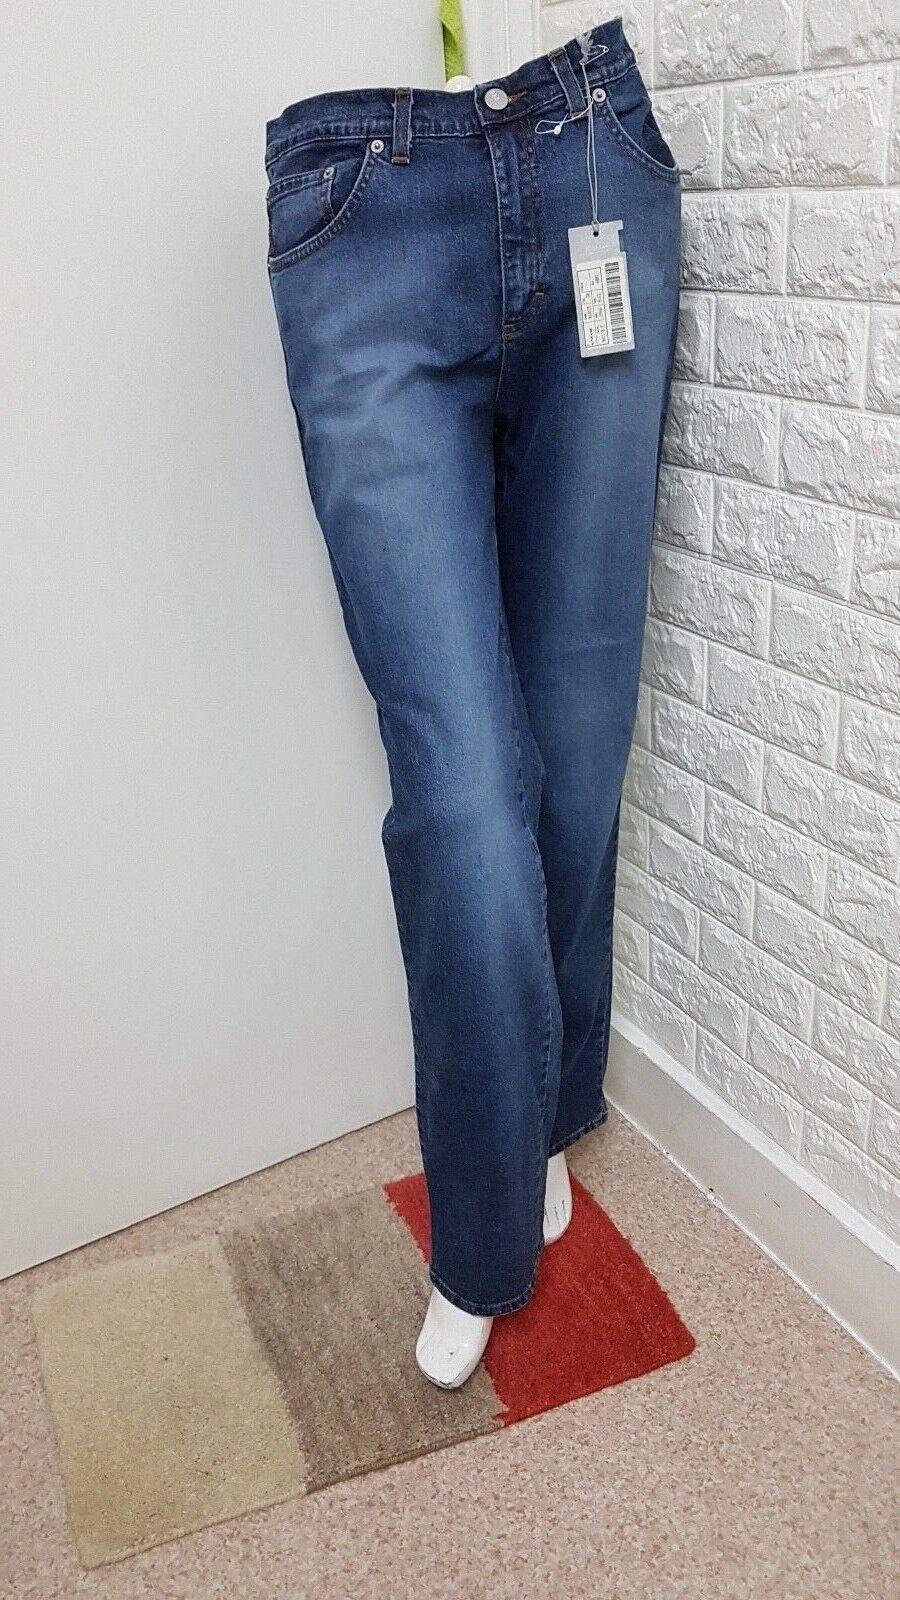 ICEJEANS ICEBERG gilmar UOMO INCREDIBILE ITALIA Jeans Taglia    30 b10e1a